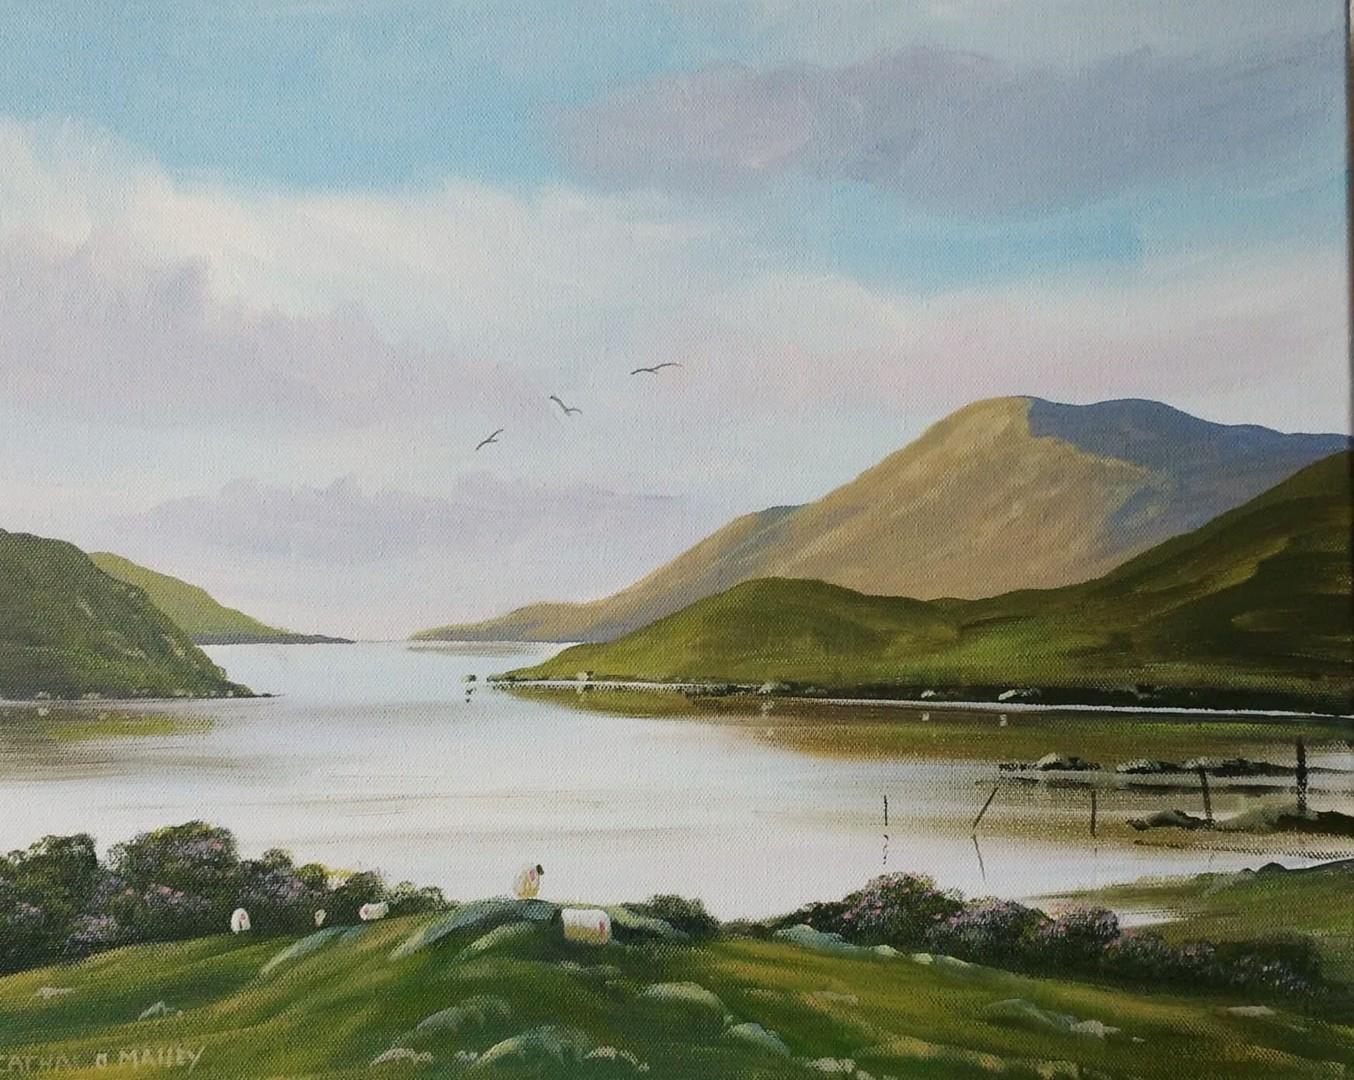 Cathal O Malley - leenane sheep,,